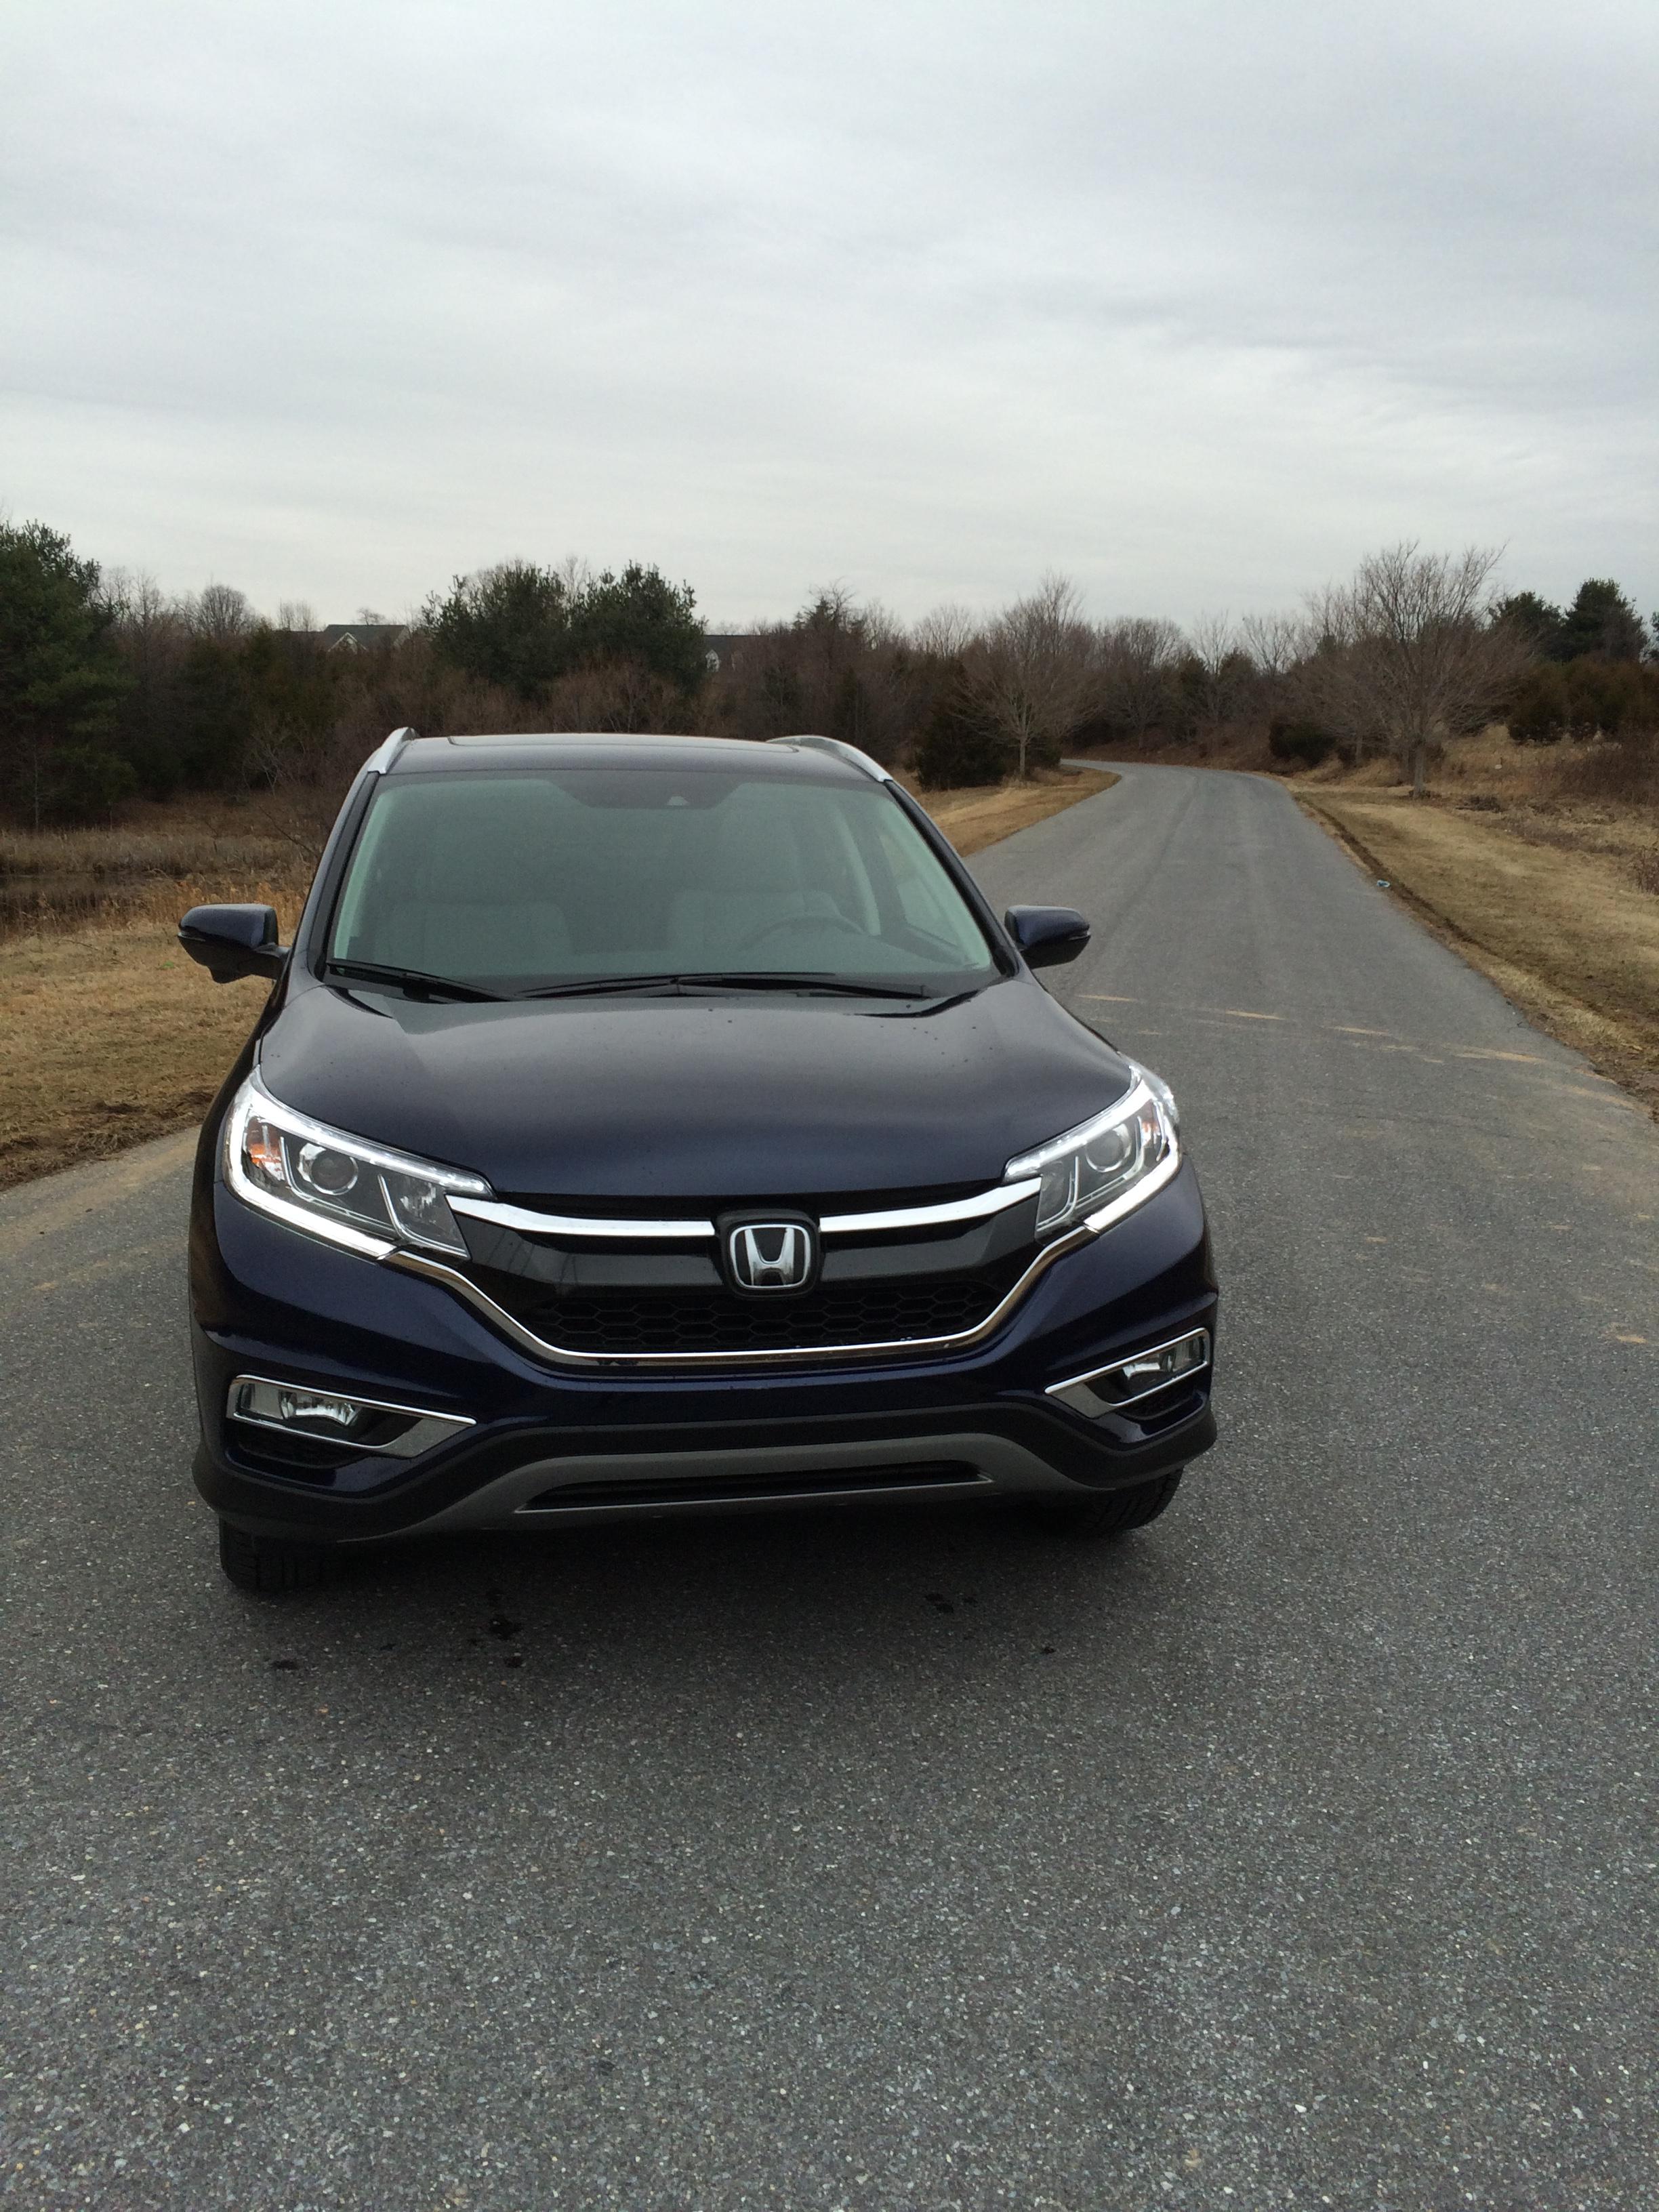 Car Report: Honda refreshes the popular CR-V for 2015